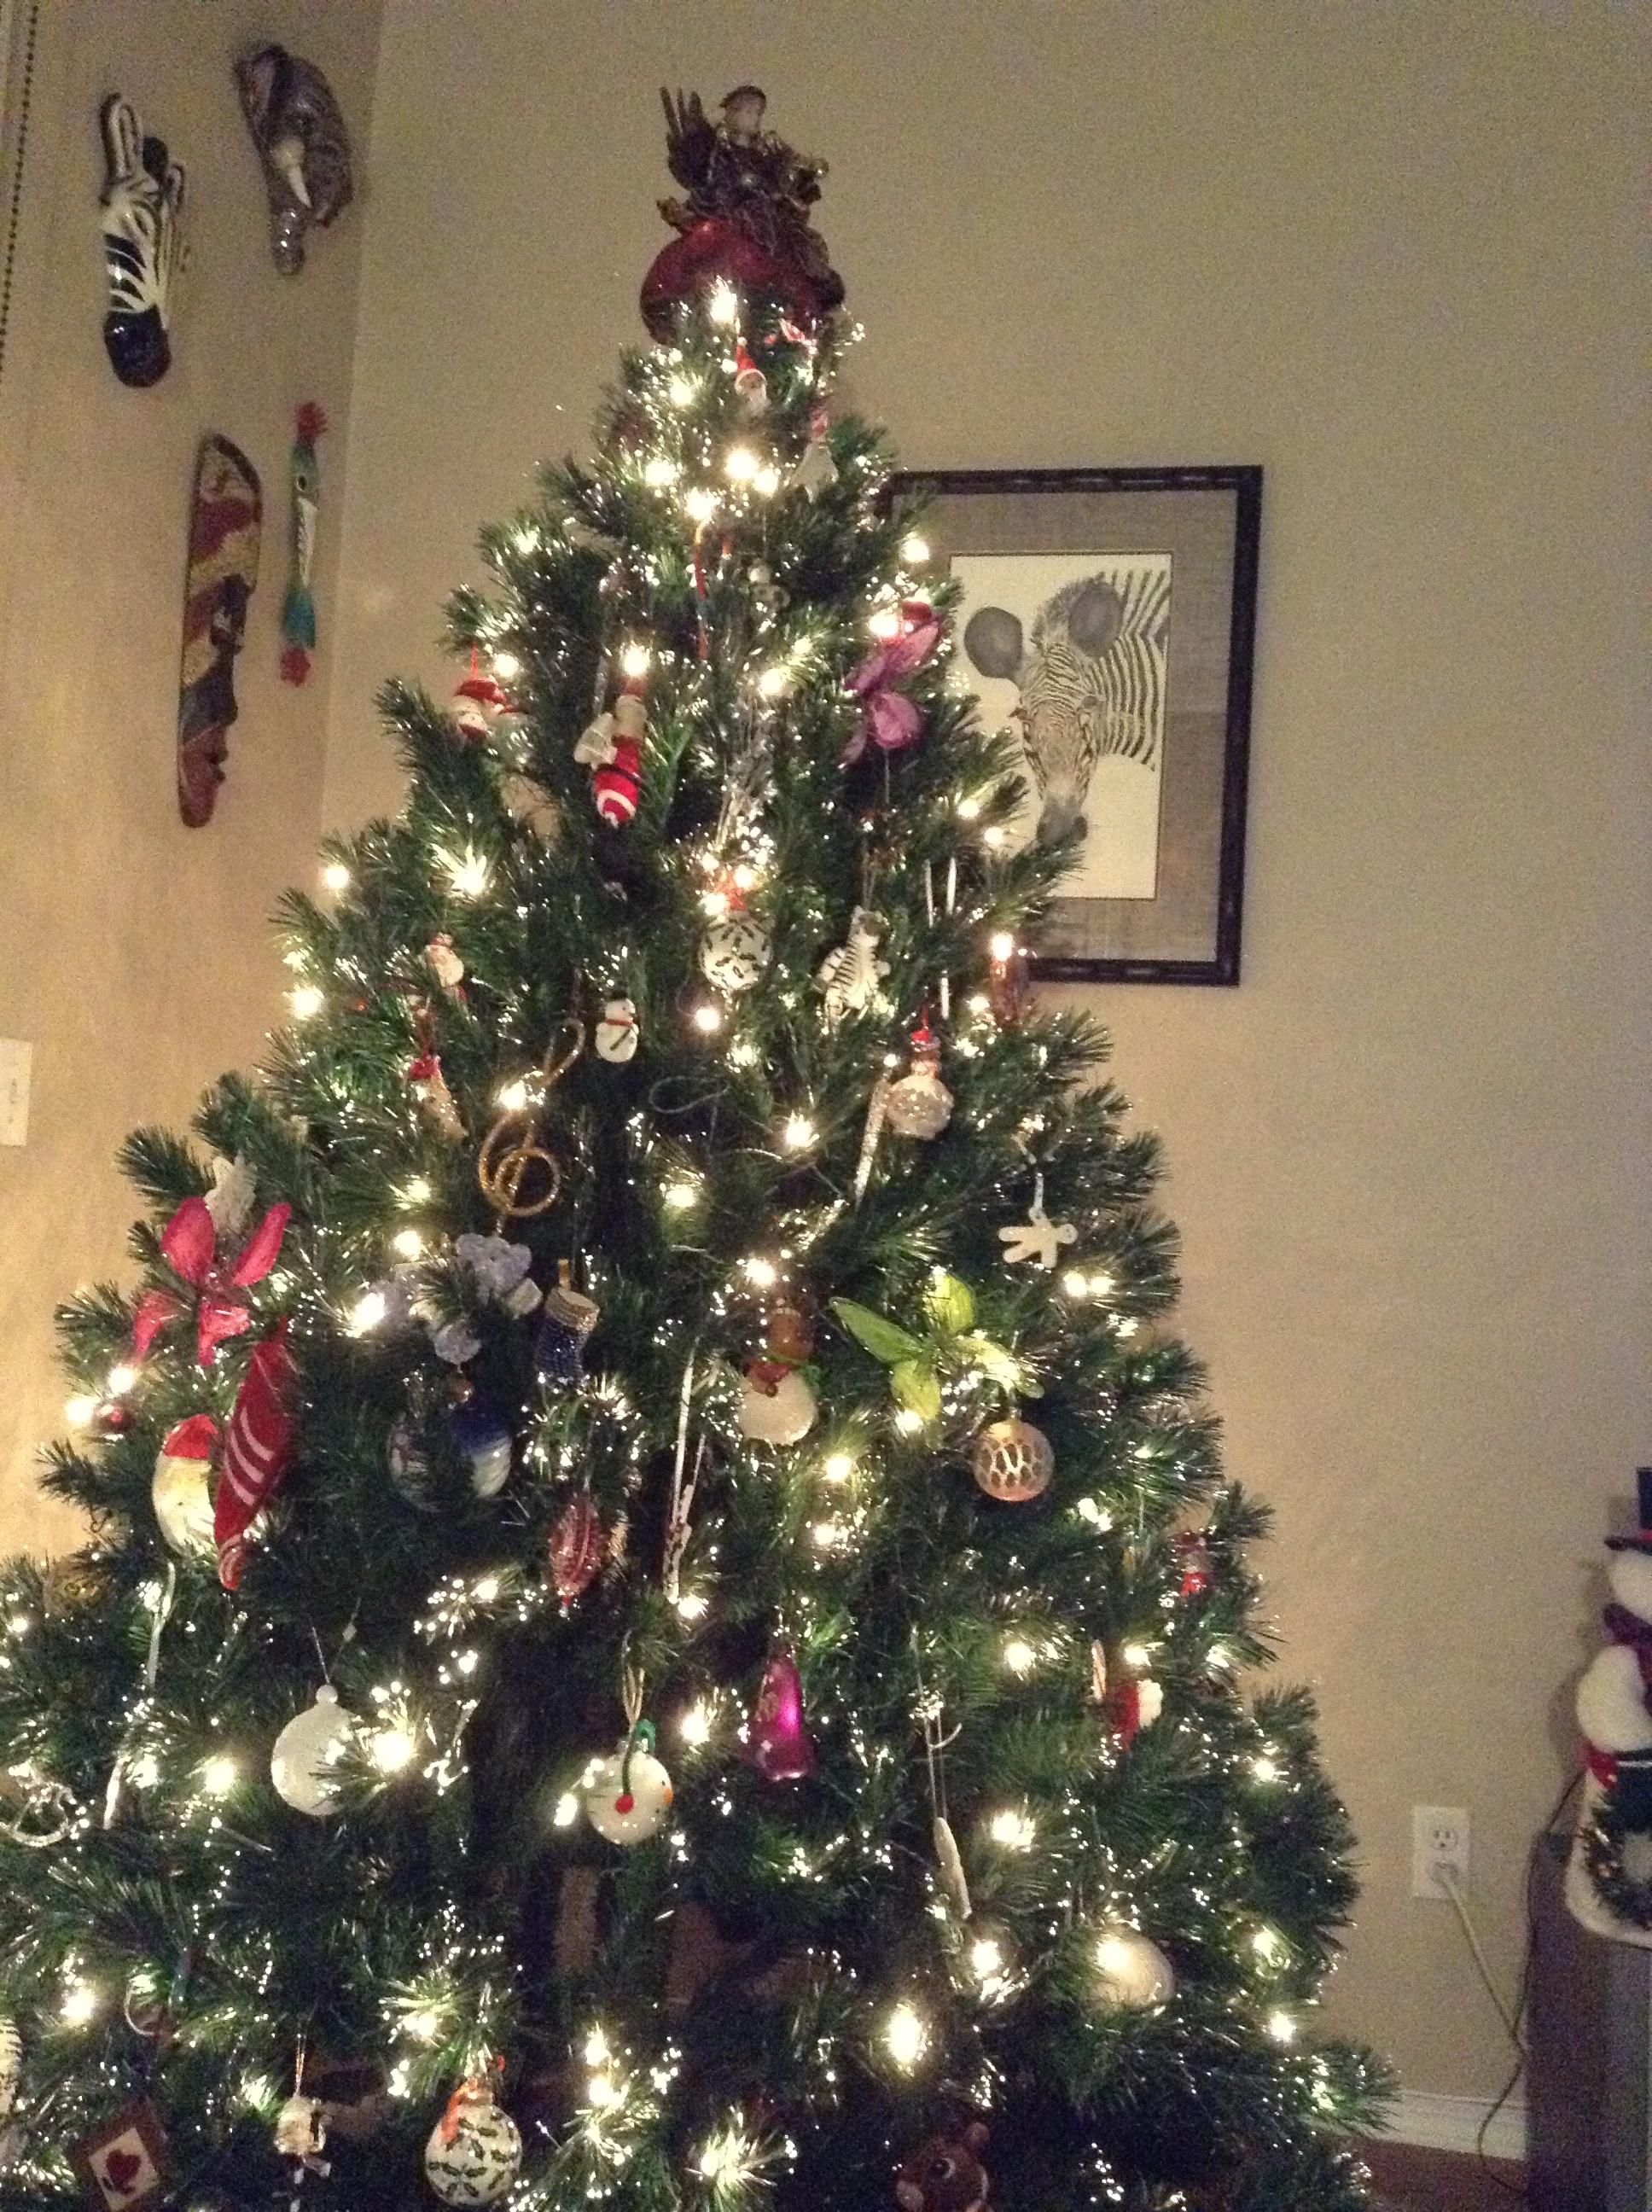 The Emery's Tree